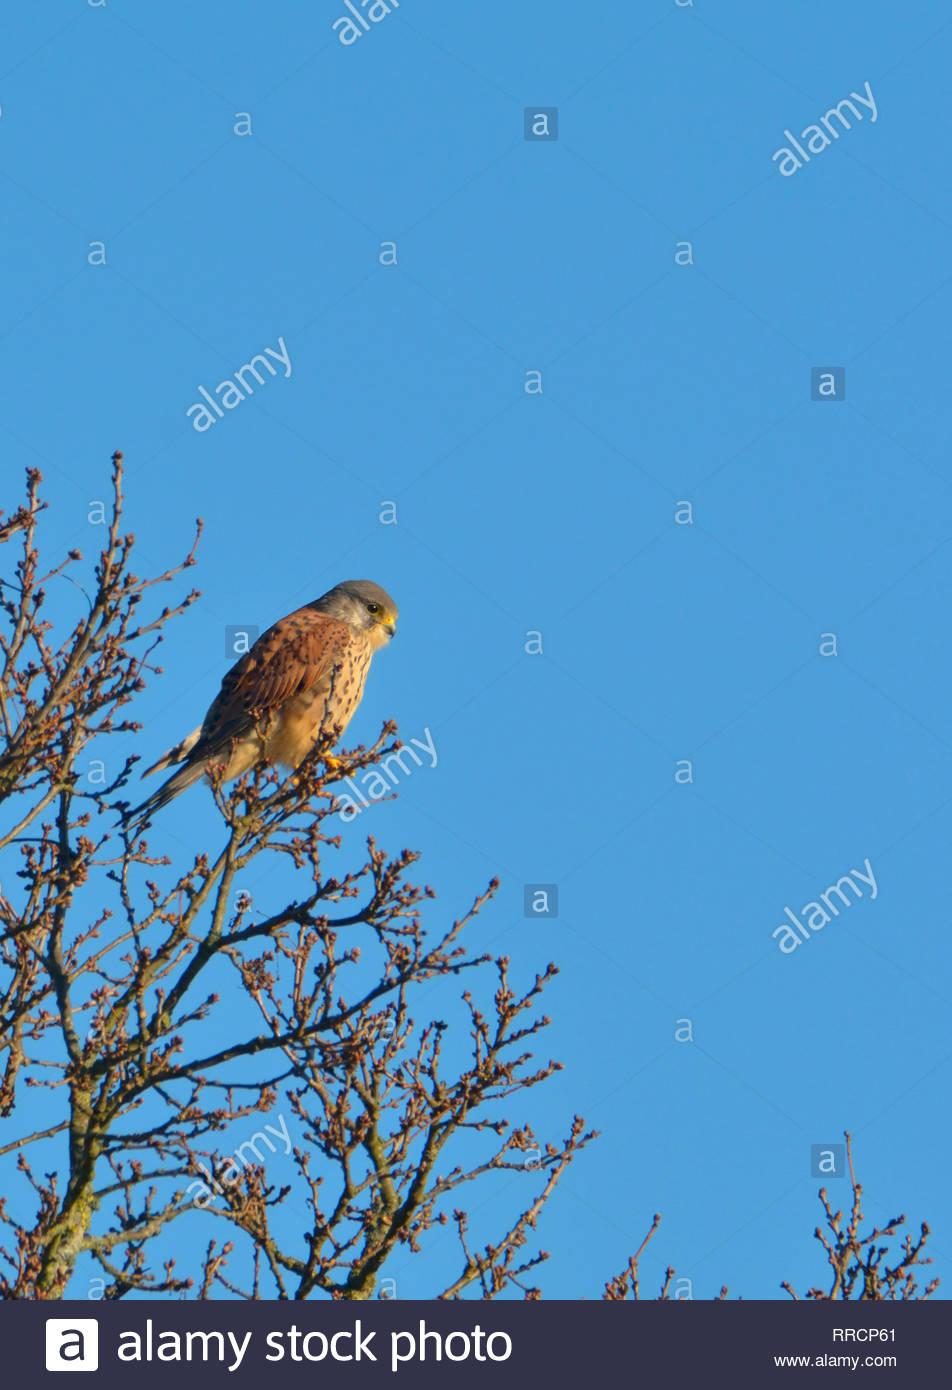 Common Kestrel (Falco tinnunculus - European kestrel, Eurasian kestrel, or Old World kestrel) Male, perching in a tree, Kent, UK, February - Stock Image